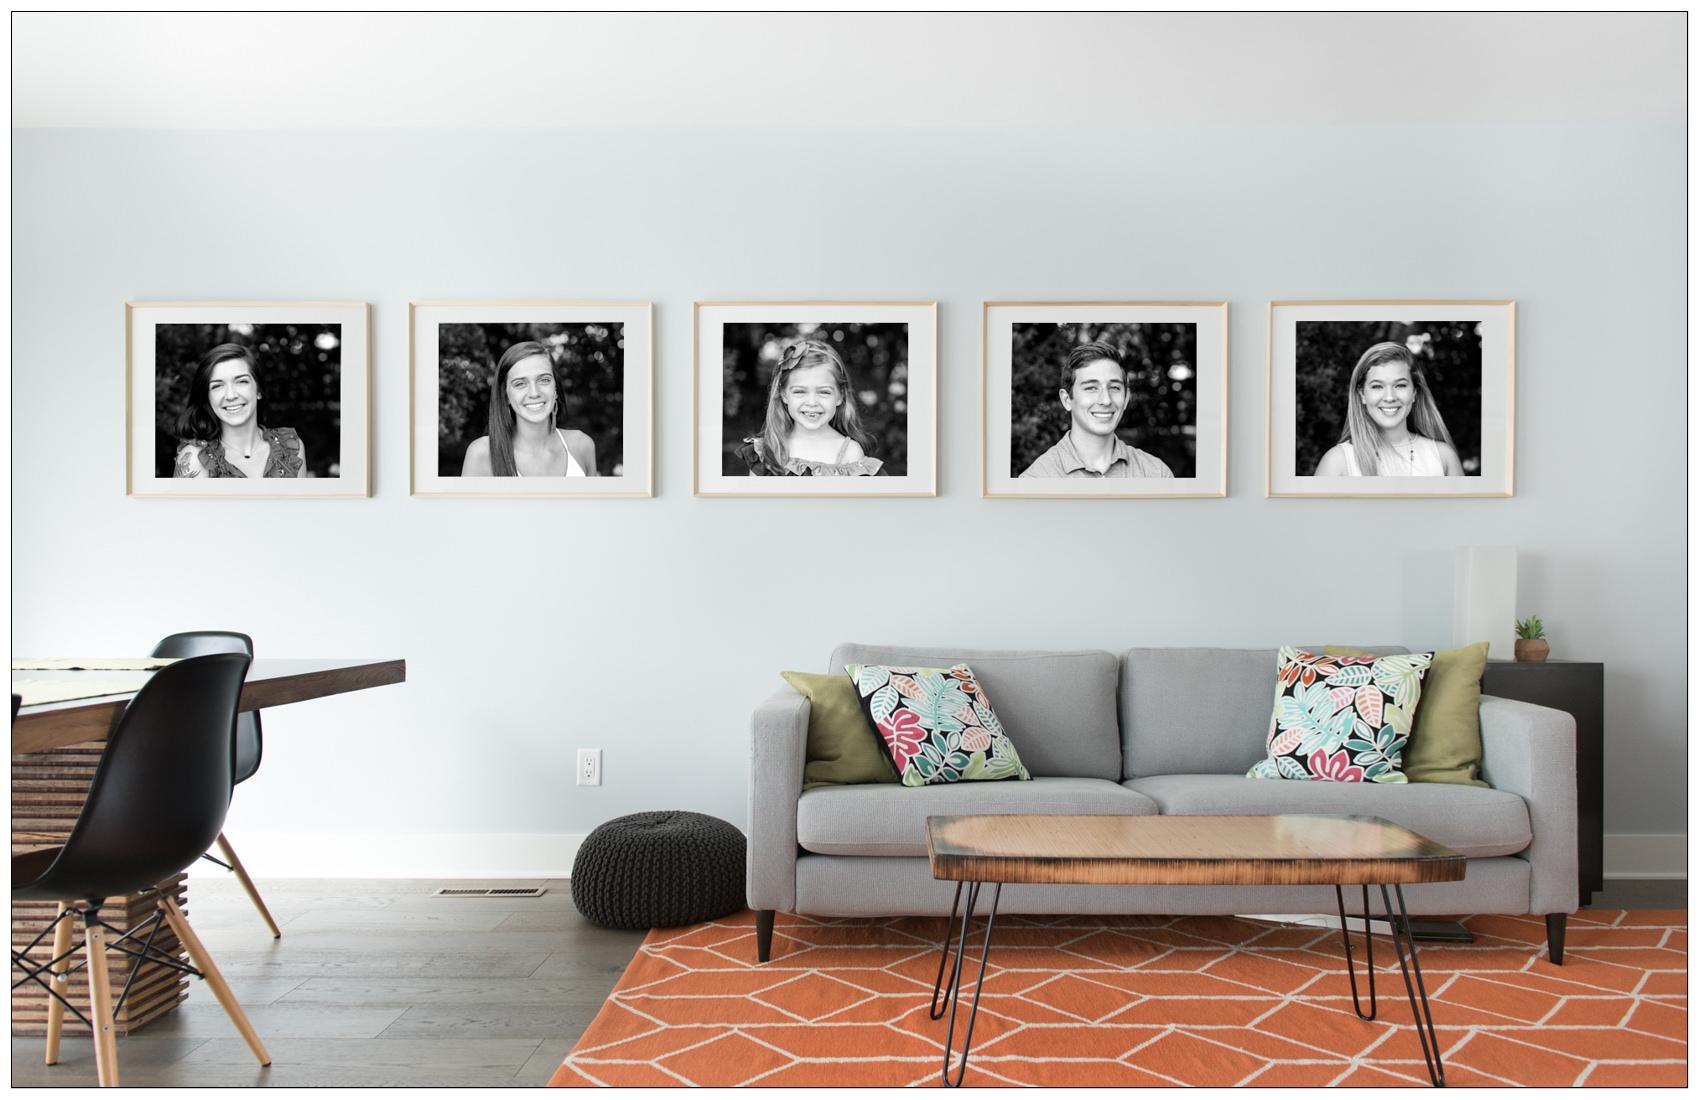 wall art1.jpg